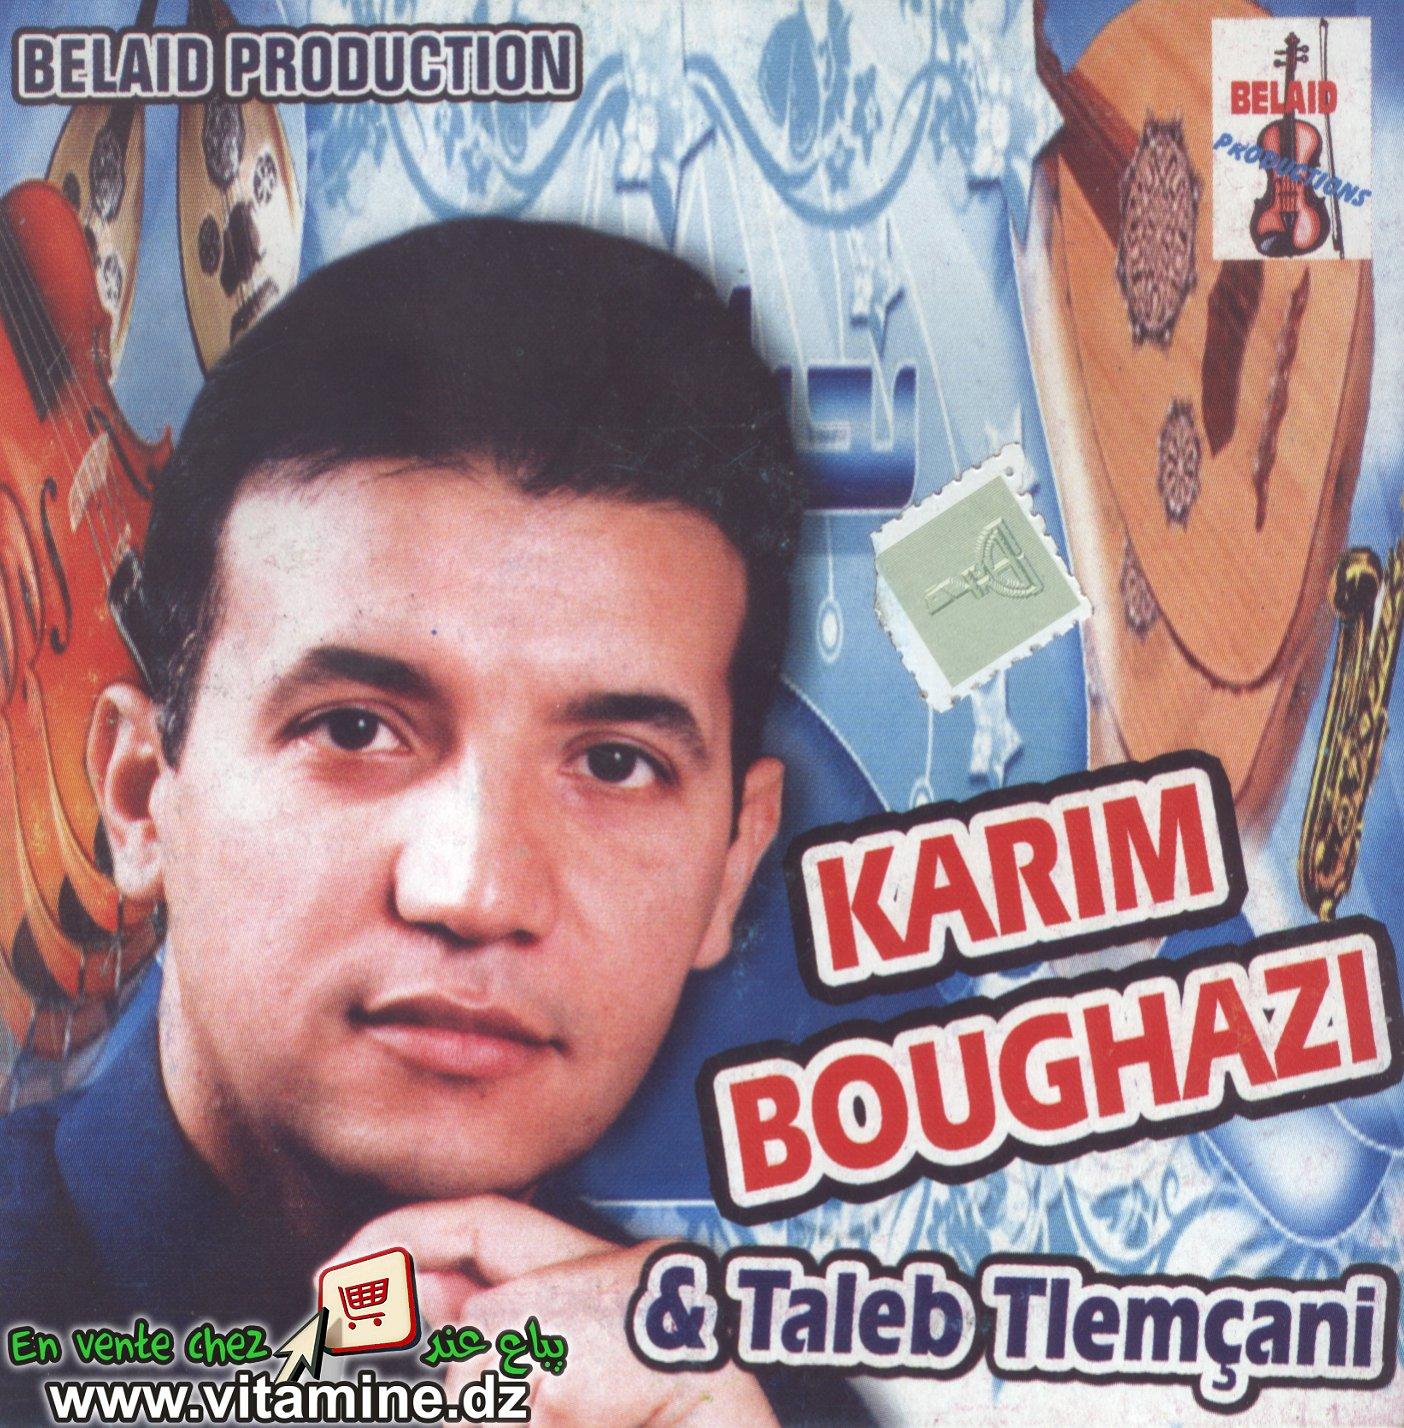 Karim Boughazi & Taleb Temçani